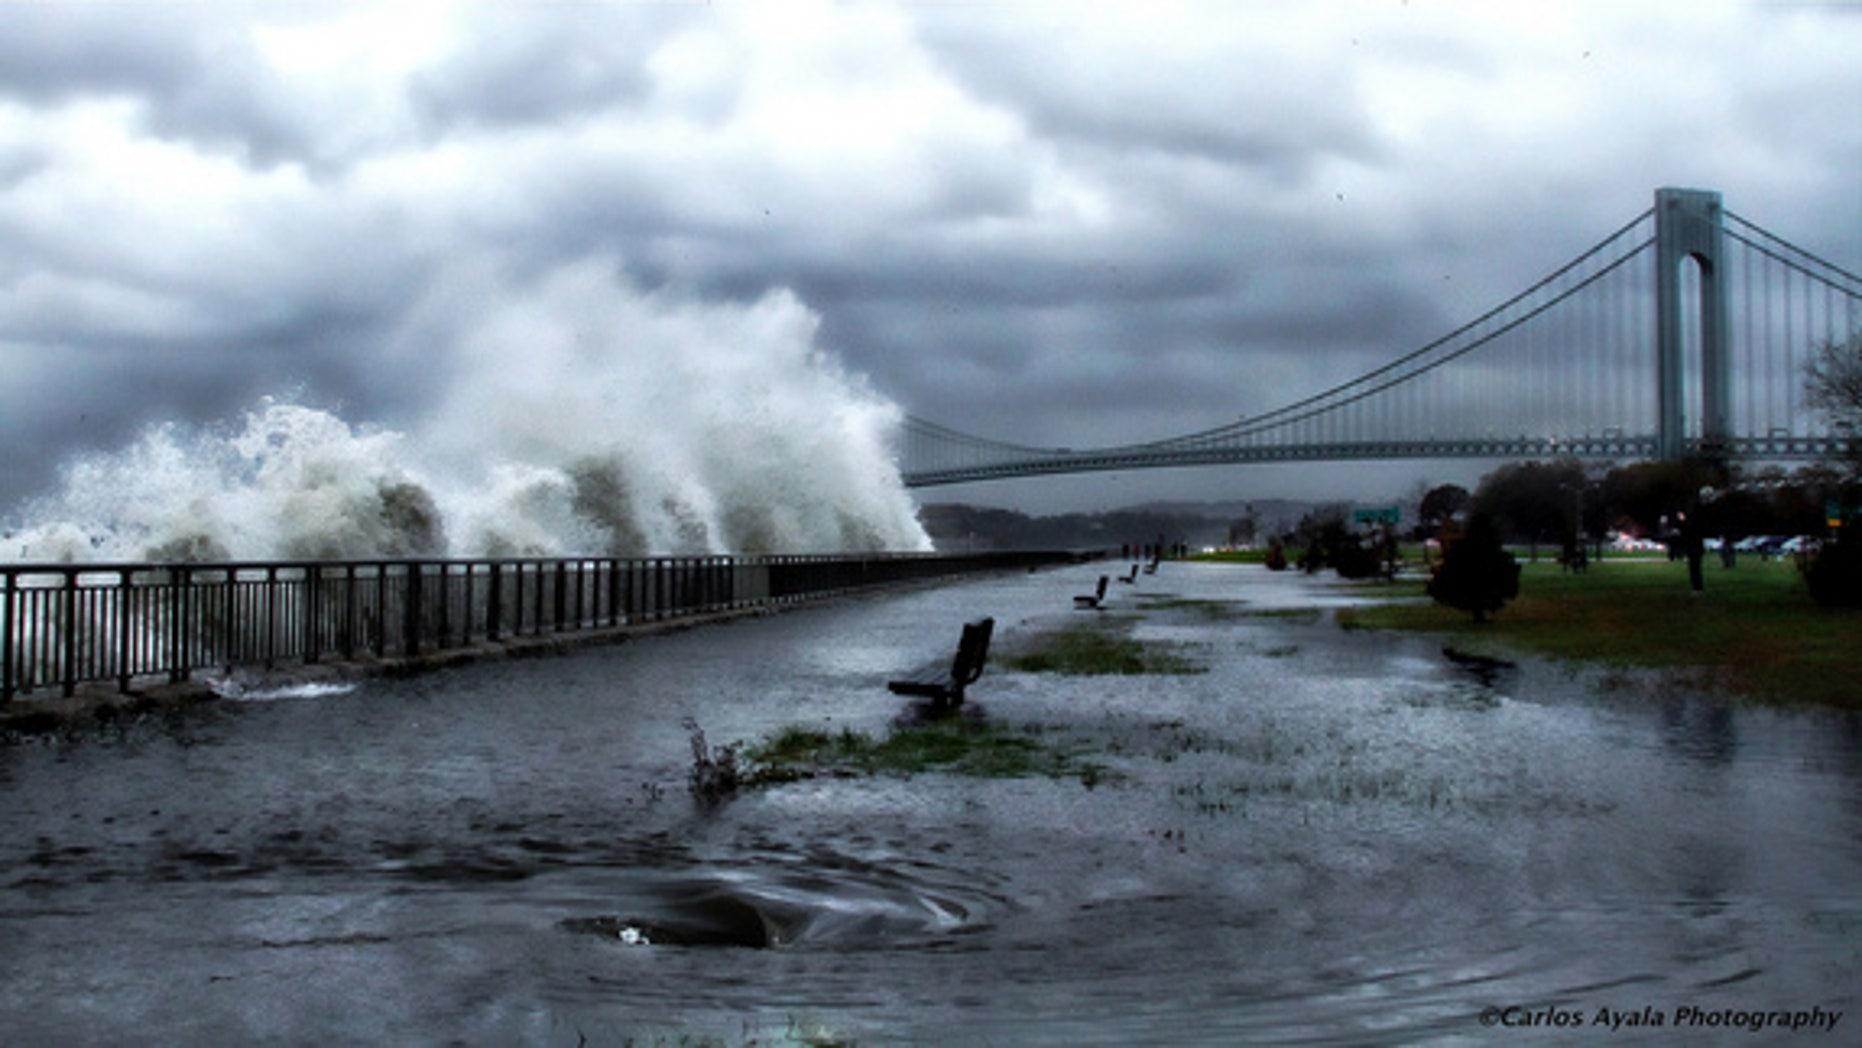 A striking image of Verrazano Bridge in Brooklyn as Hurricane Sandy approaches on Oct. 29, 2012.